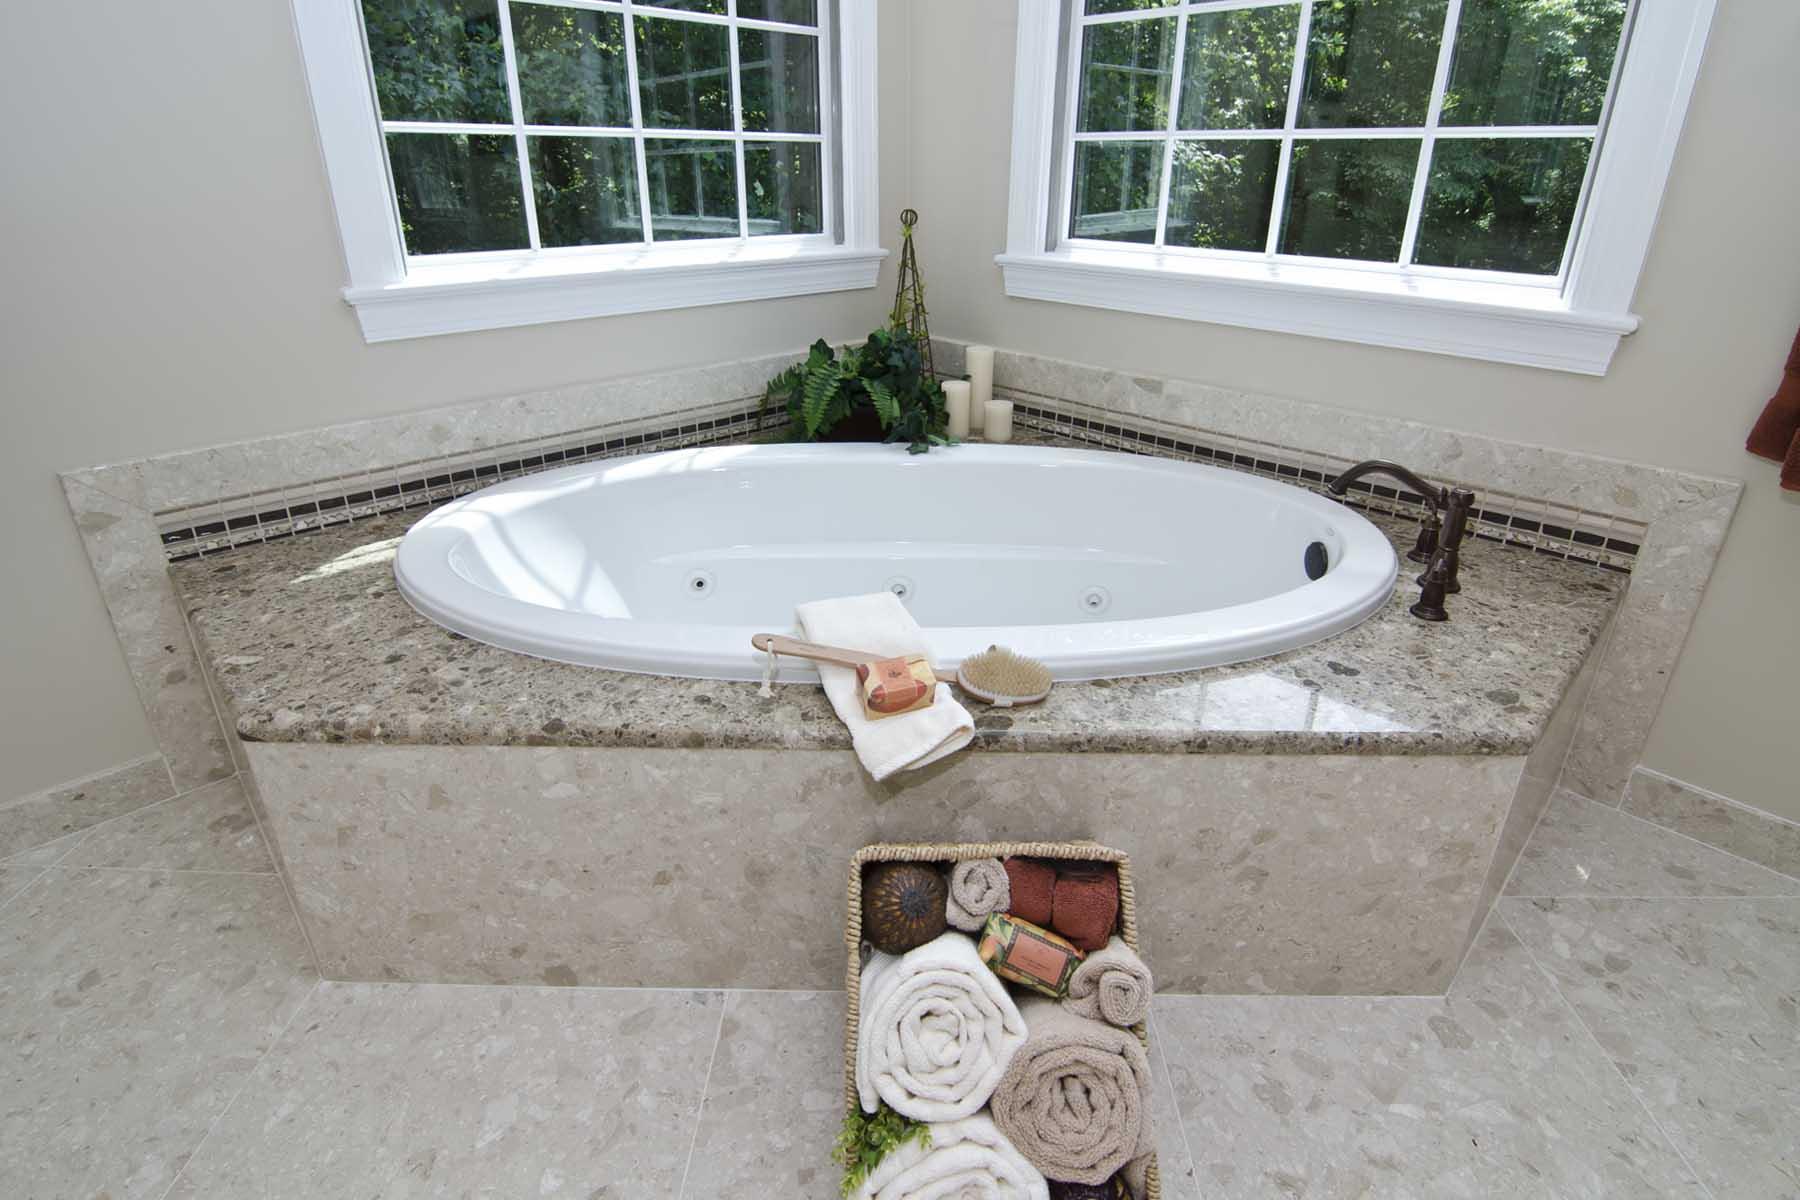 Verona Showers Tub Deck, Riser, Floor, and Baseboard